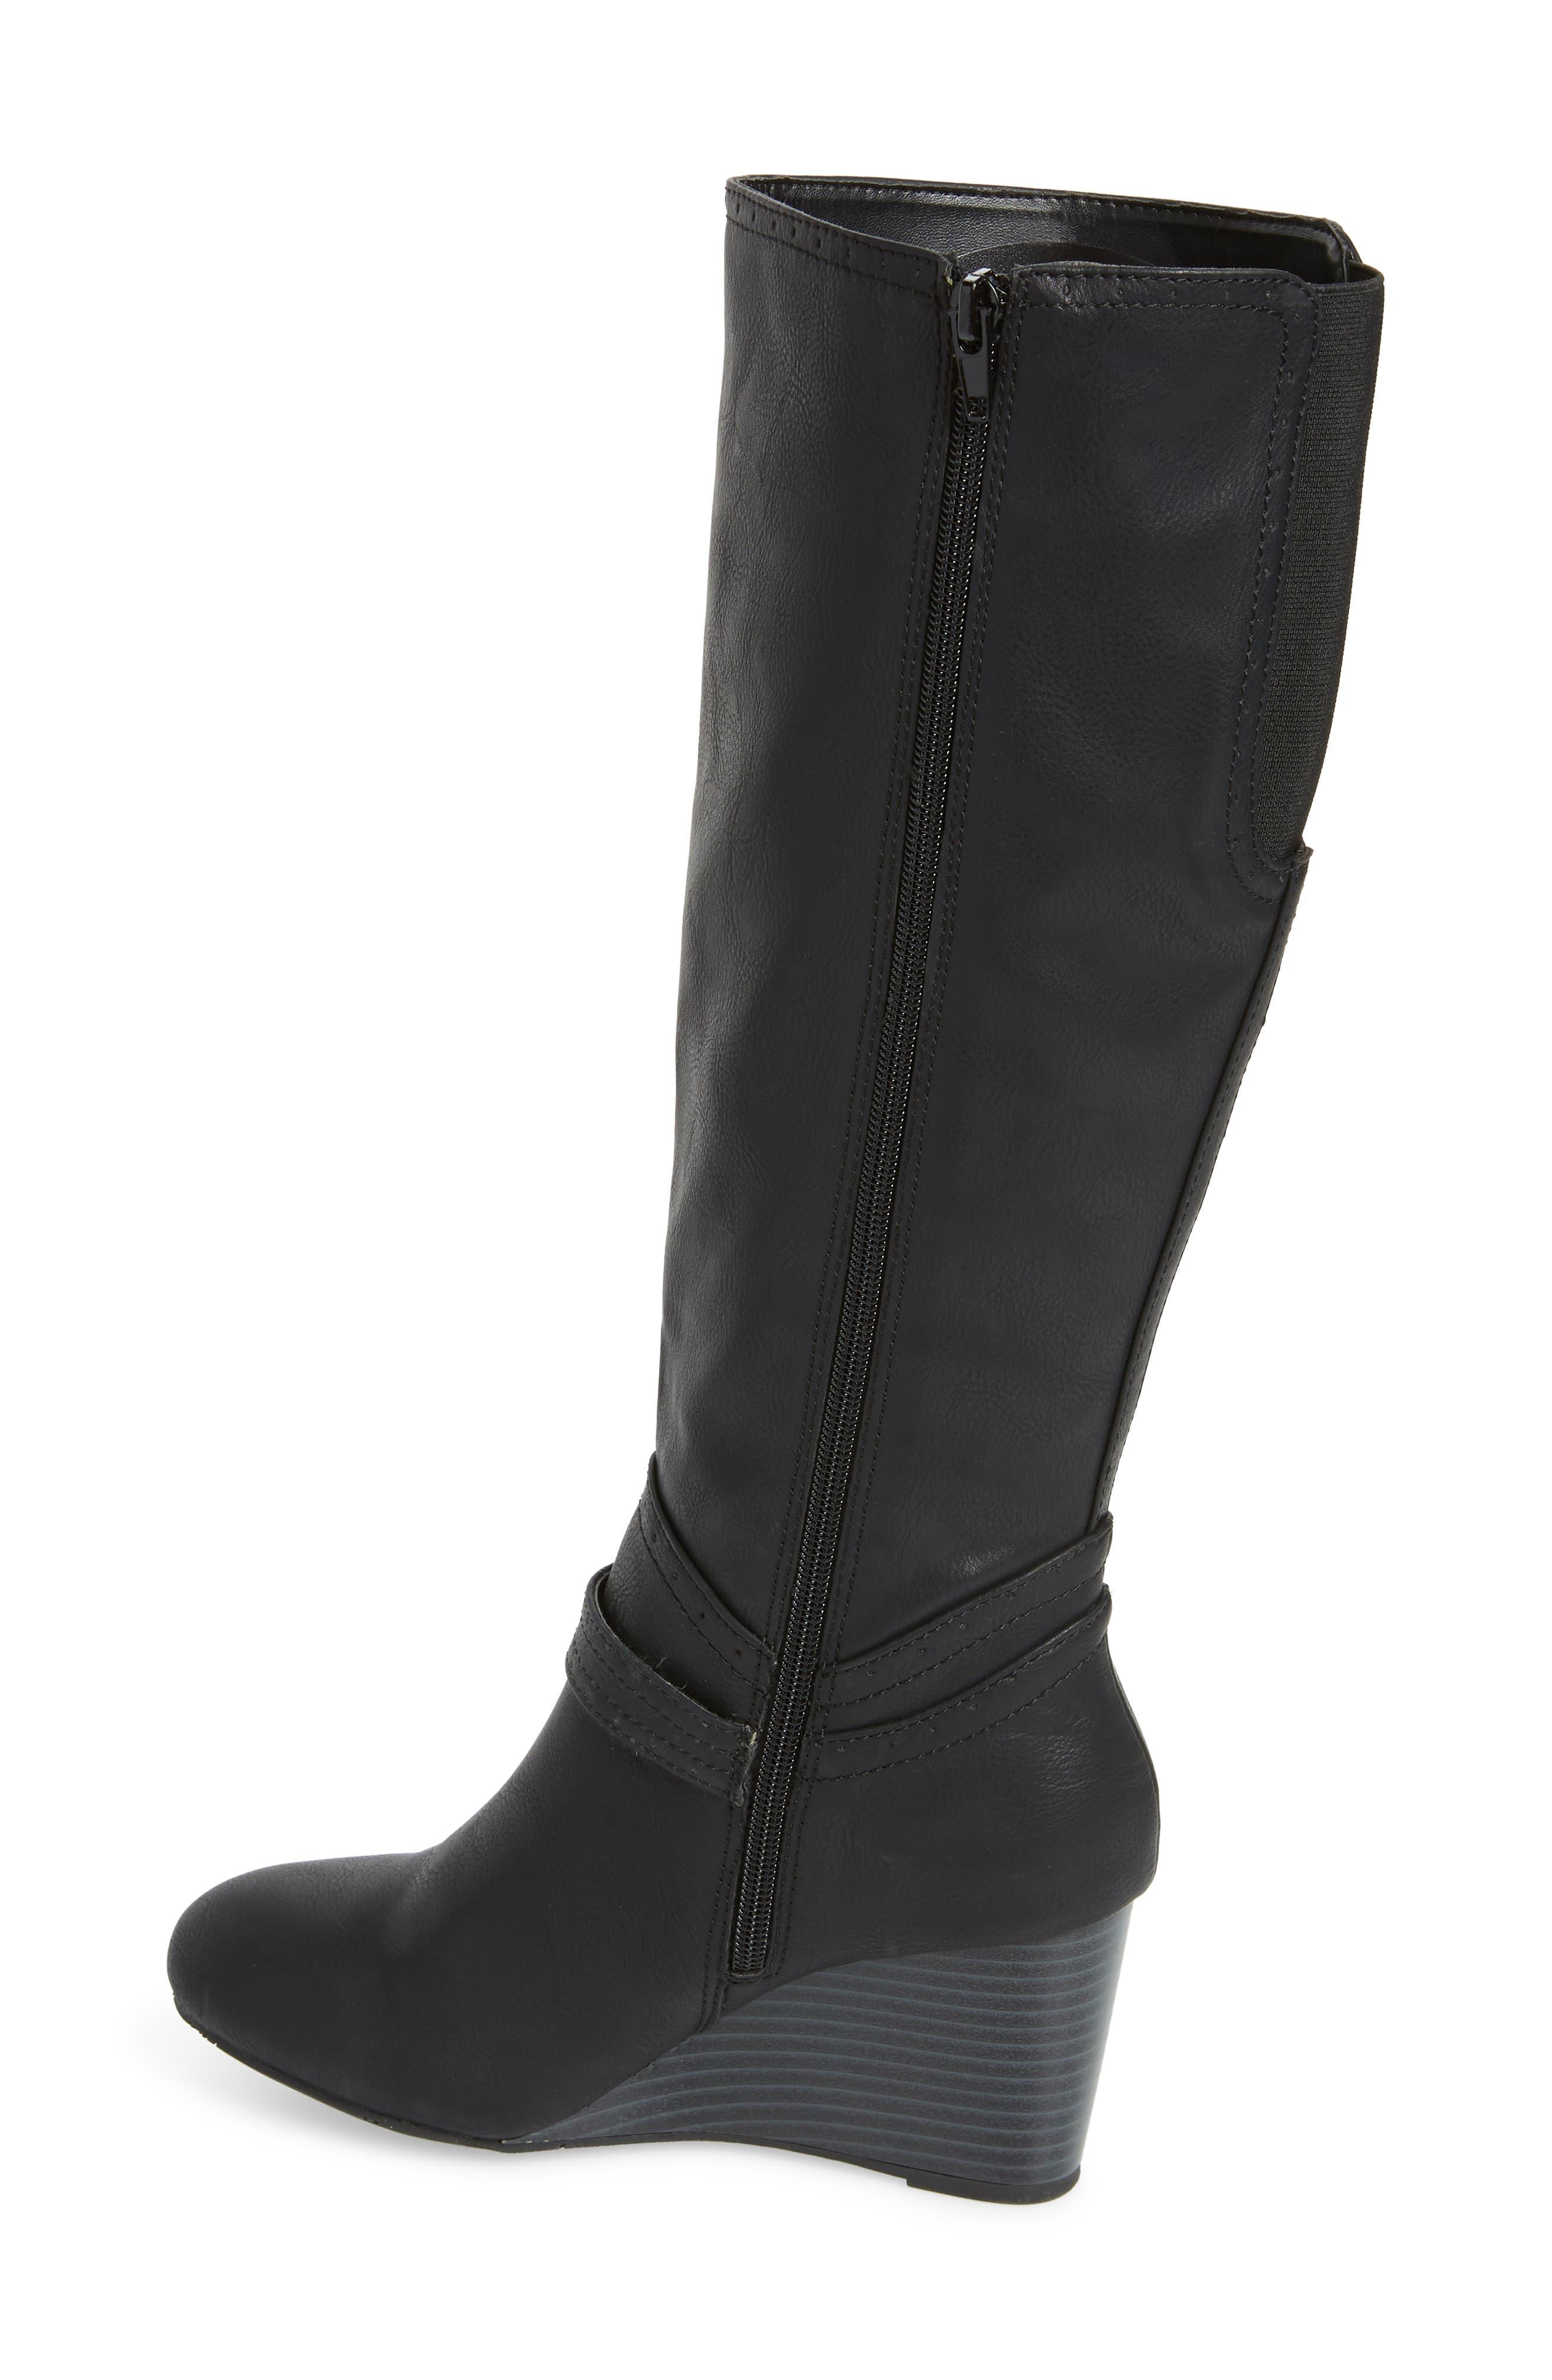 Claretta Knee High Wedge Boot,                             Alternate thumbnail 2, color,                             BLACK VEGAN LEATHER